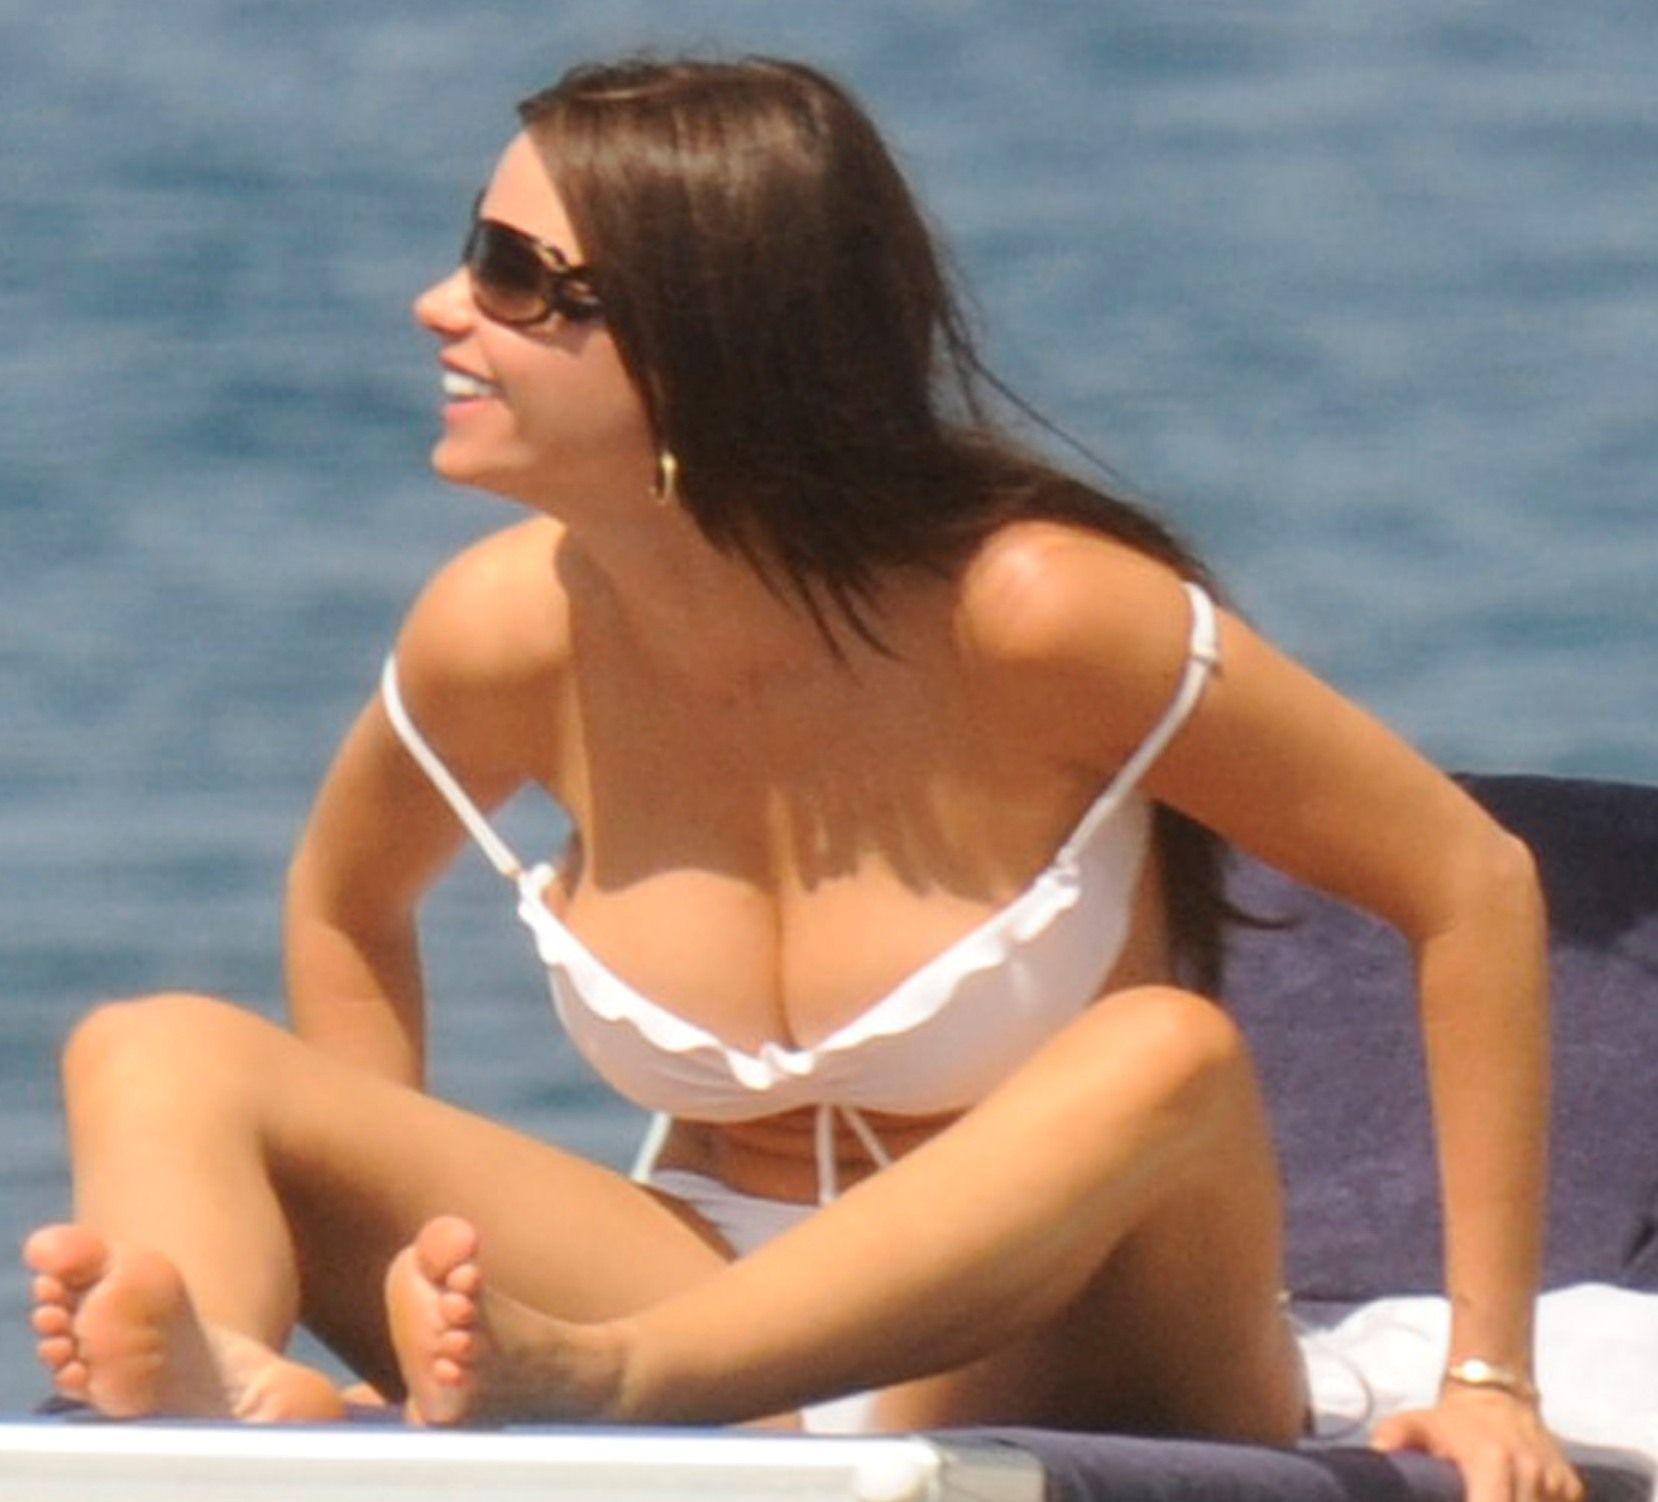 big natural tits nude | sofia vergara big tits bikini 150 x 150